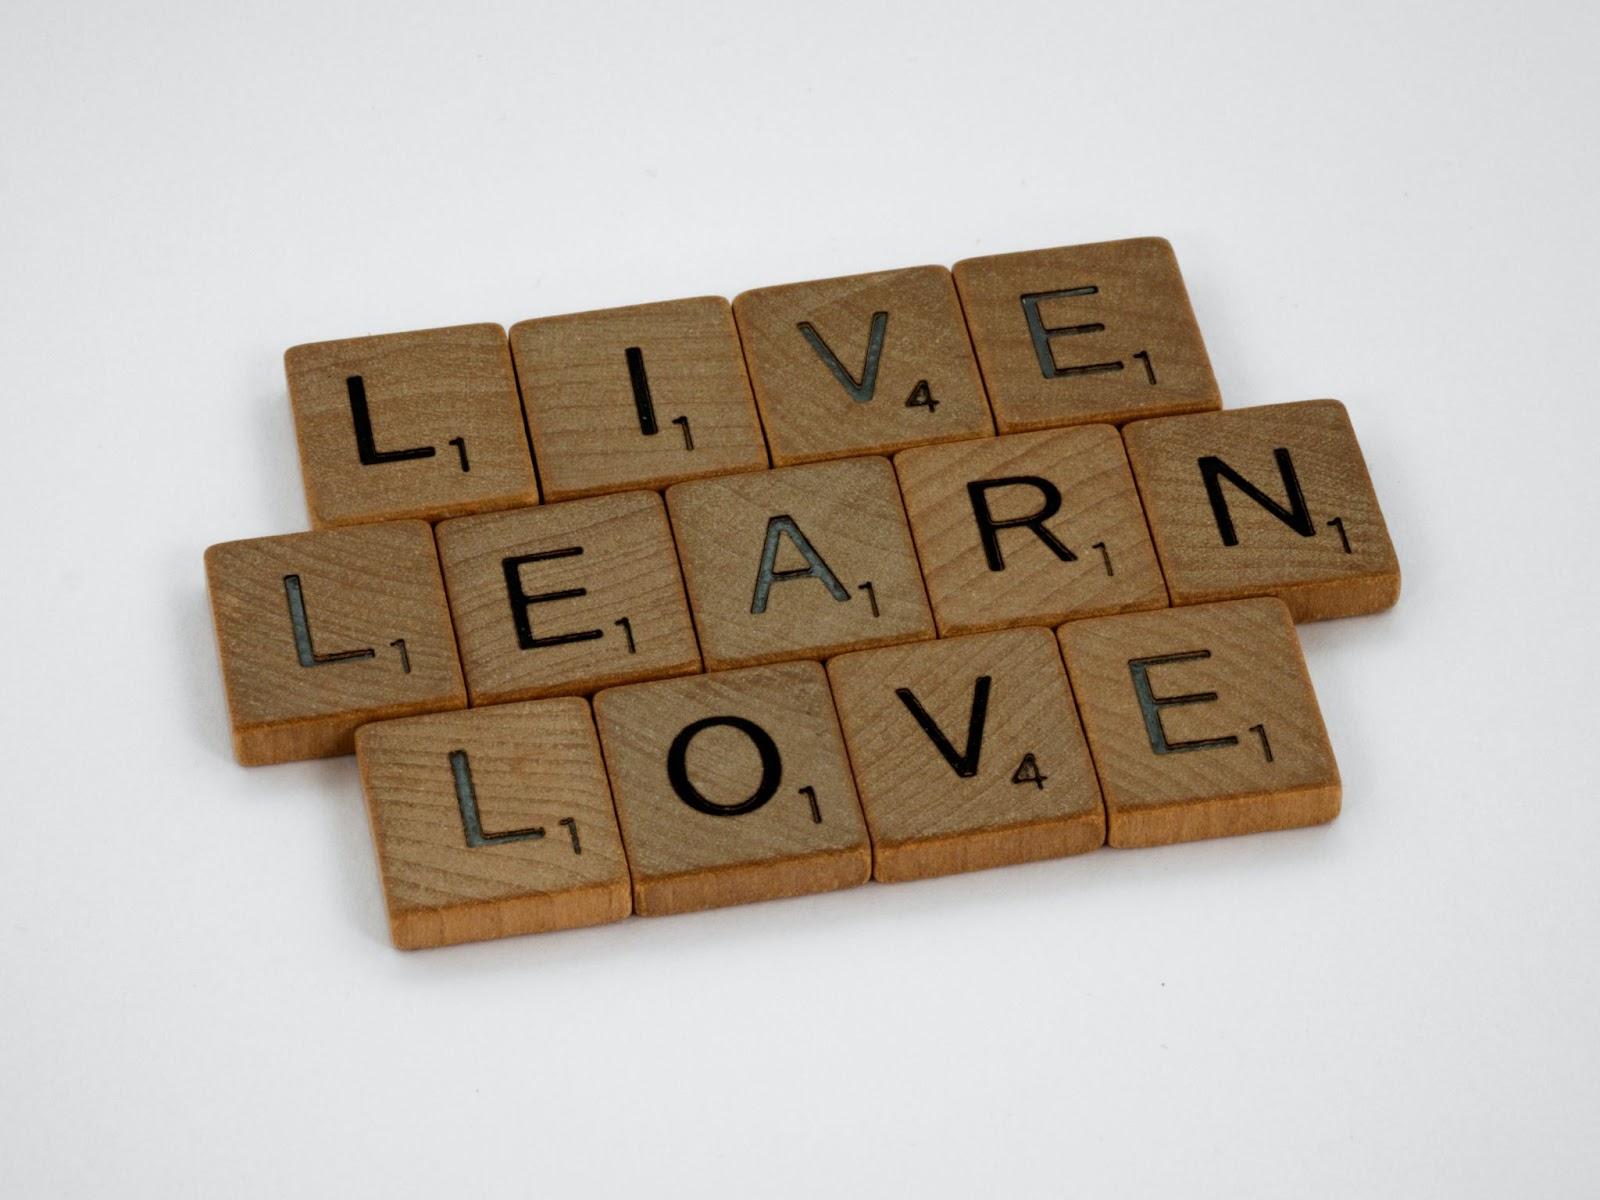 Live, love, learn digital marketing